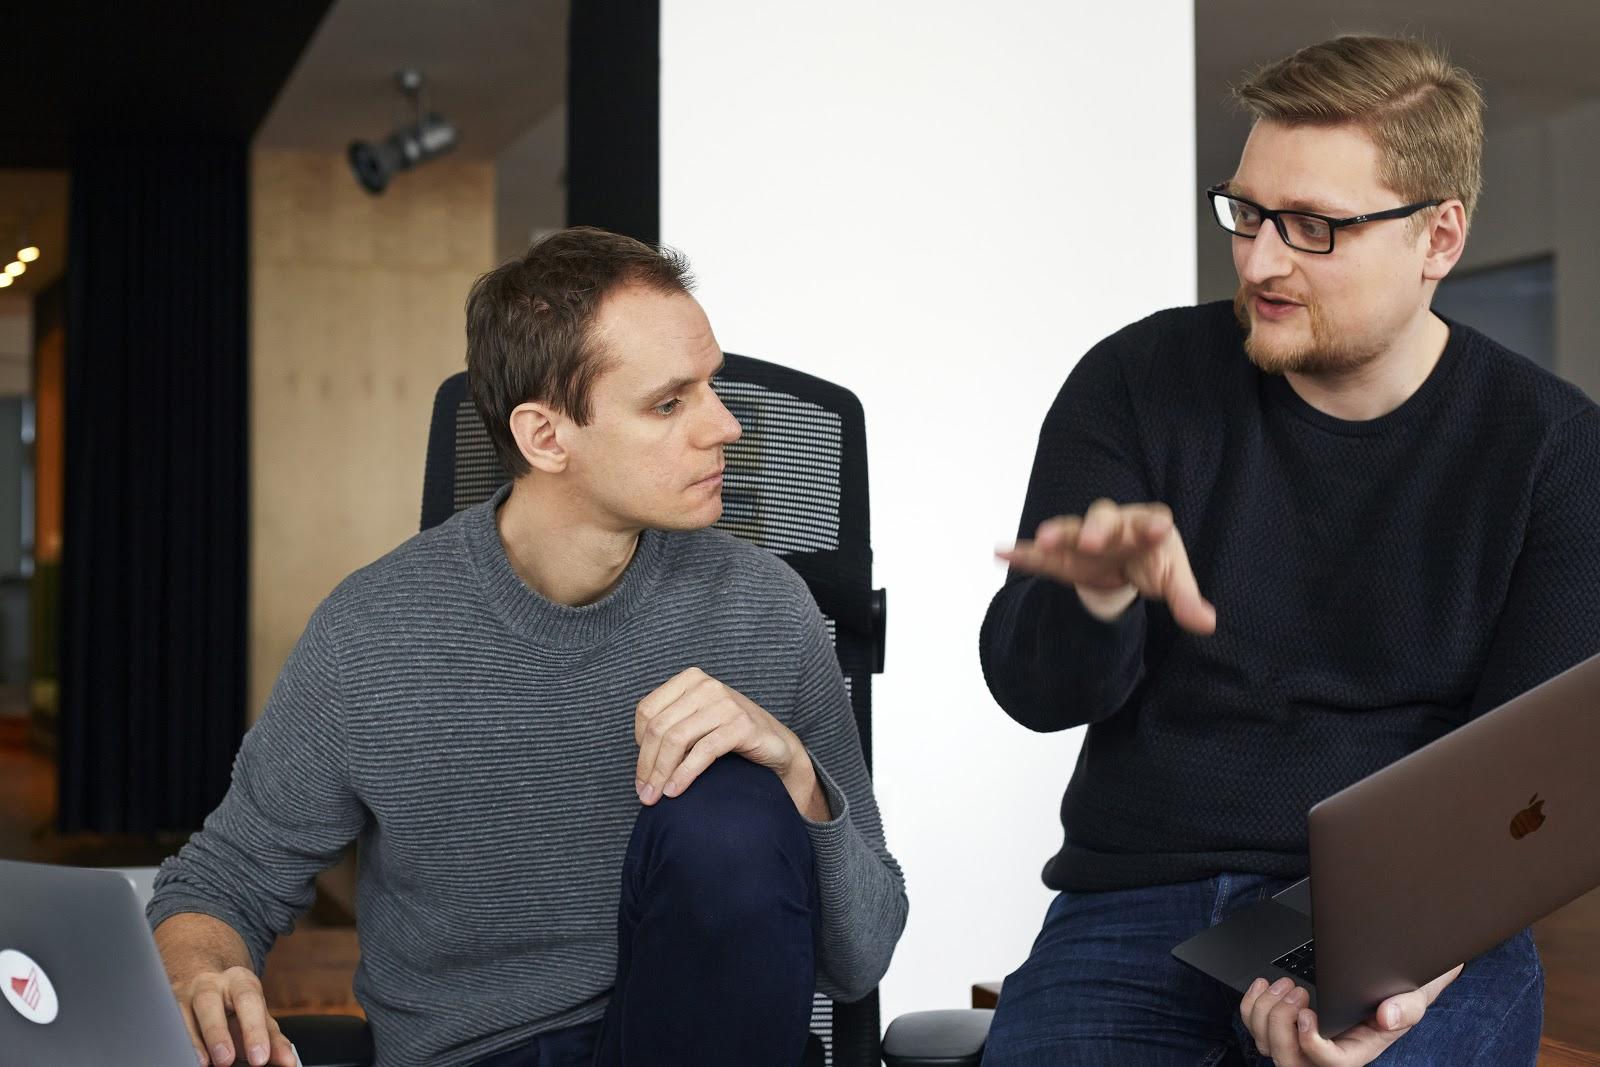 Szymon Boniecki and Bartosz Rega